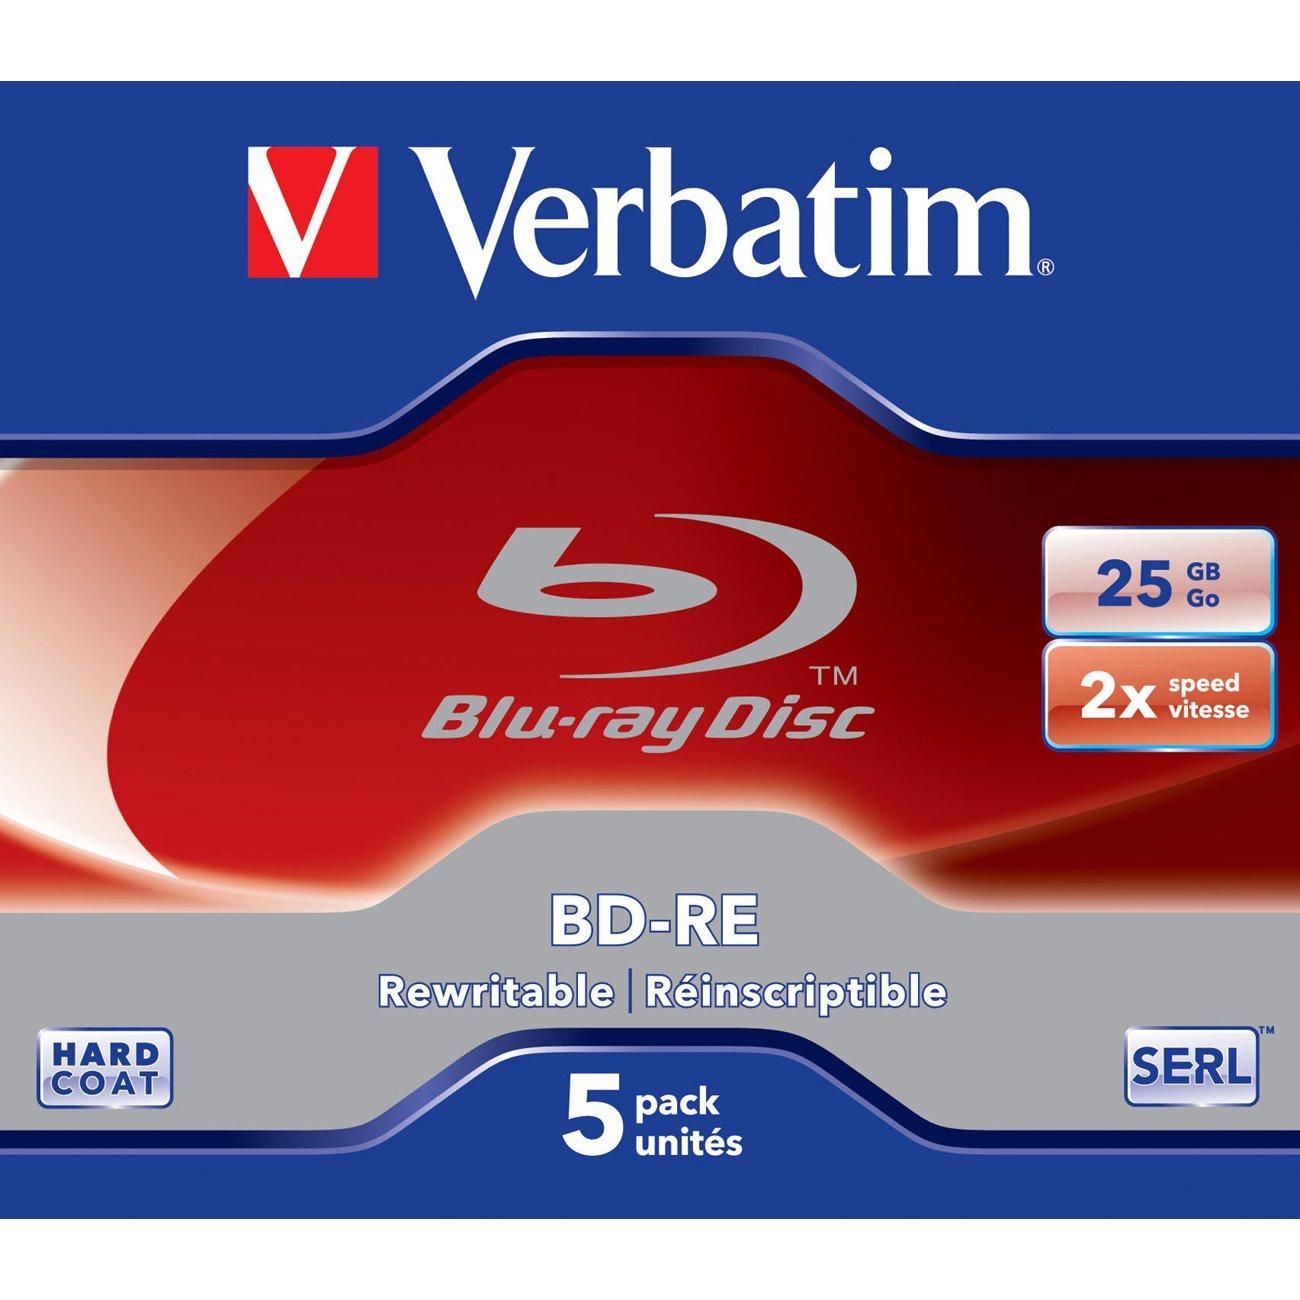 Verbatim 43615 Blu-ray Rewritable Media - BD-RE - 2x - 25 GB - 5 Pack Jewel Case